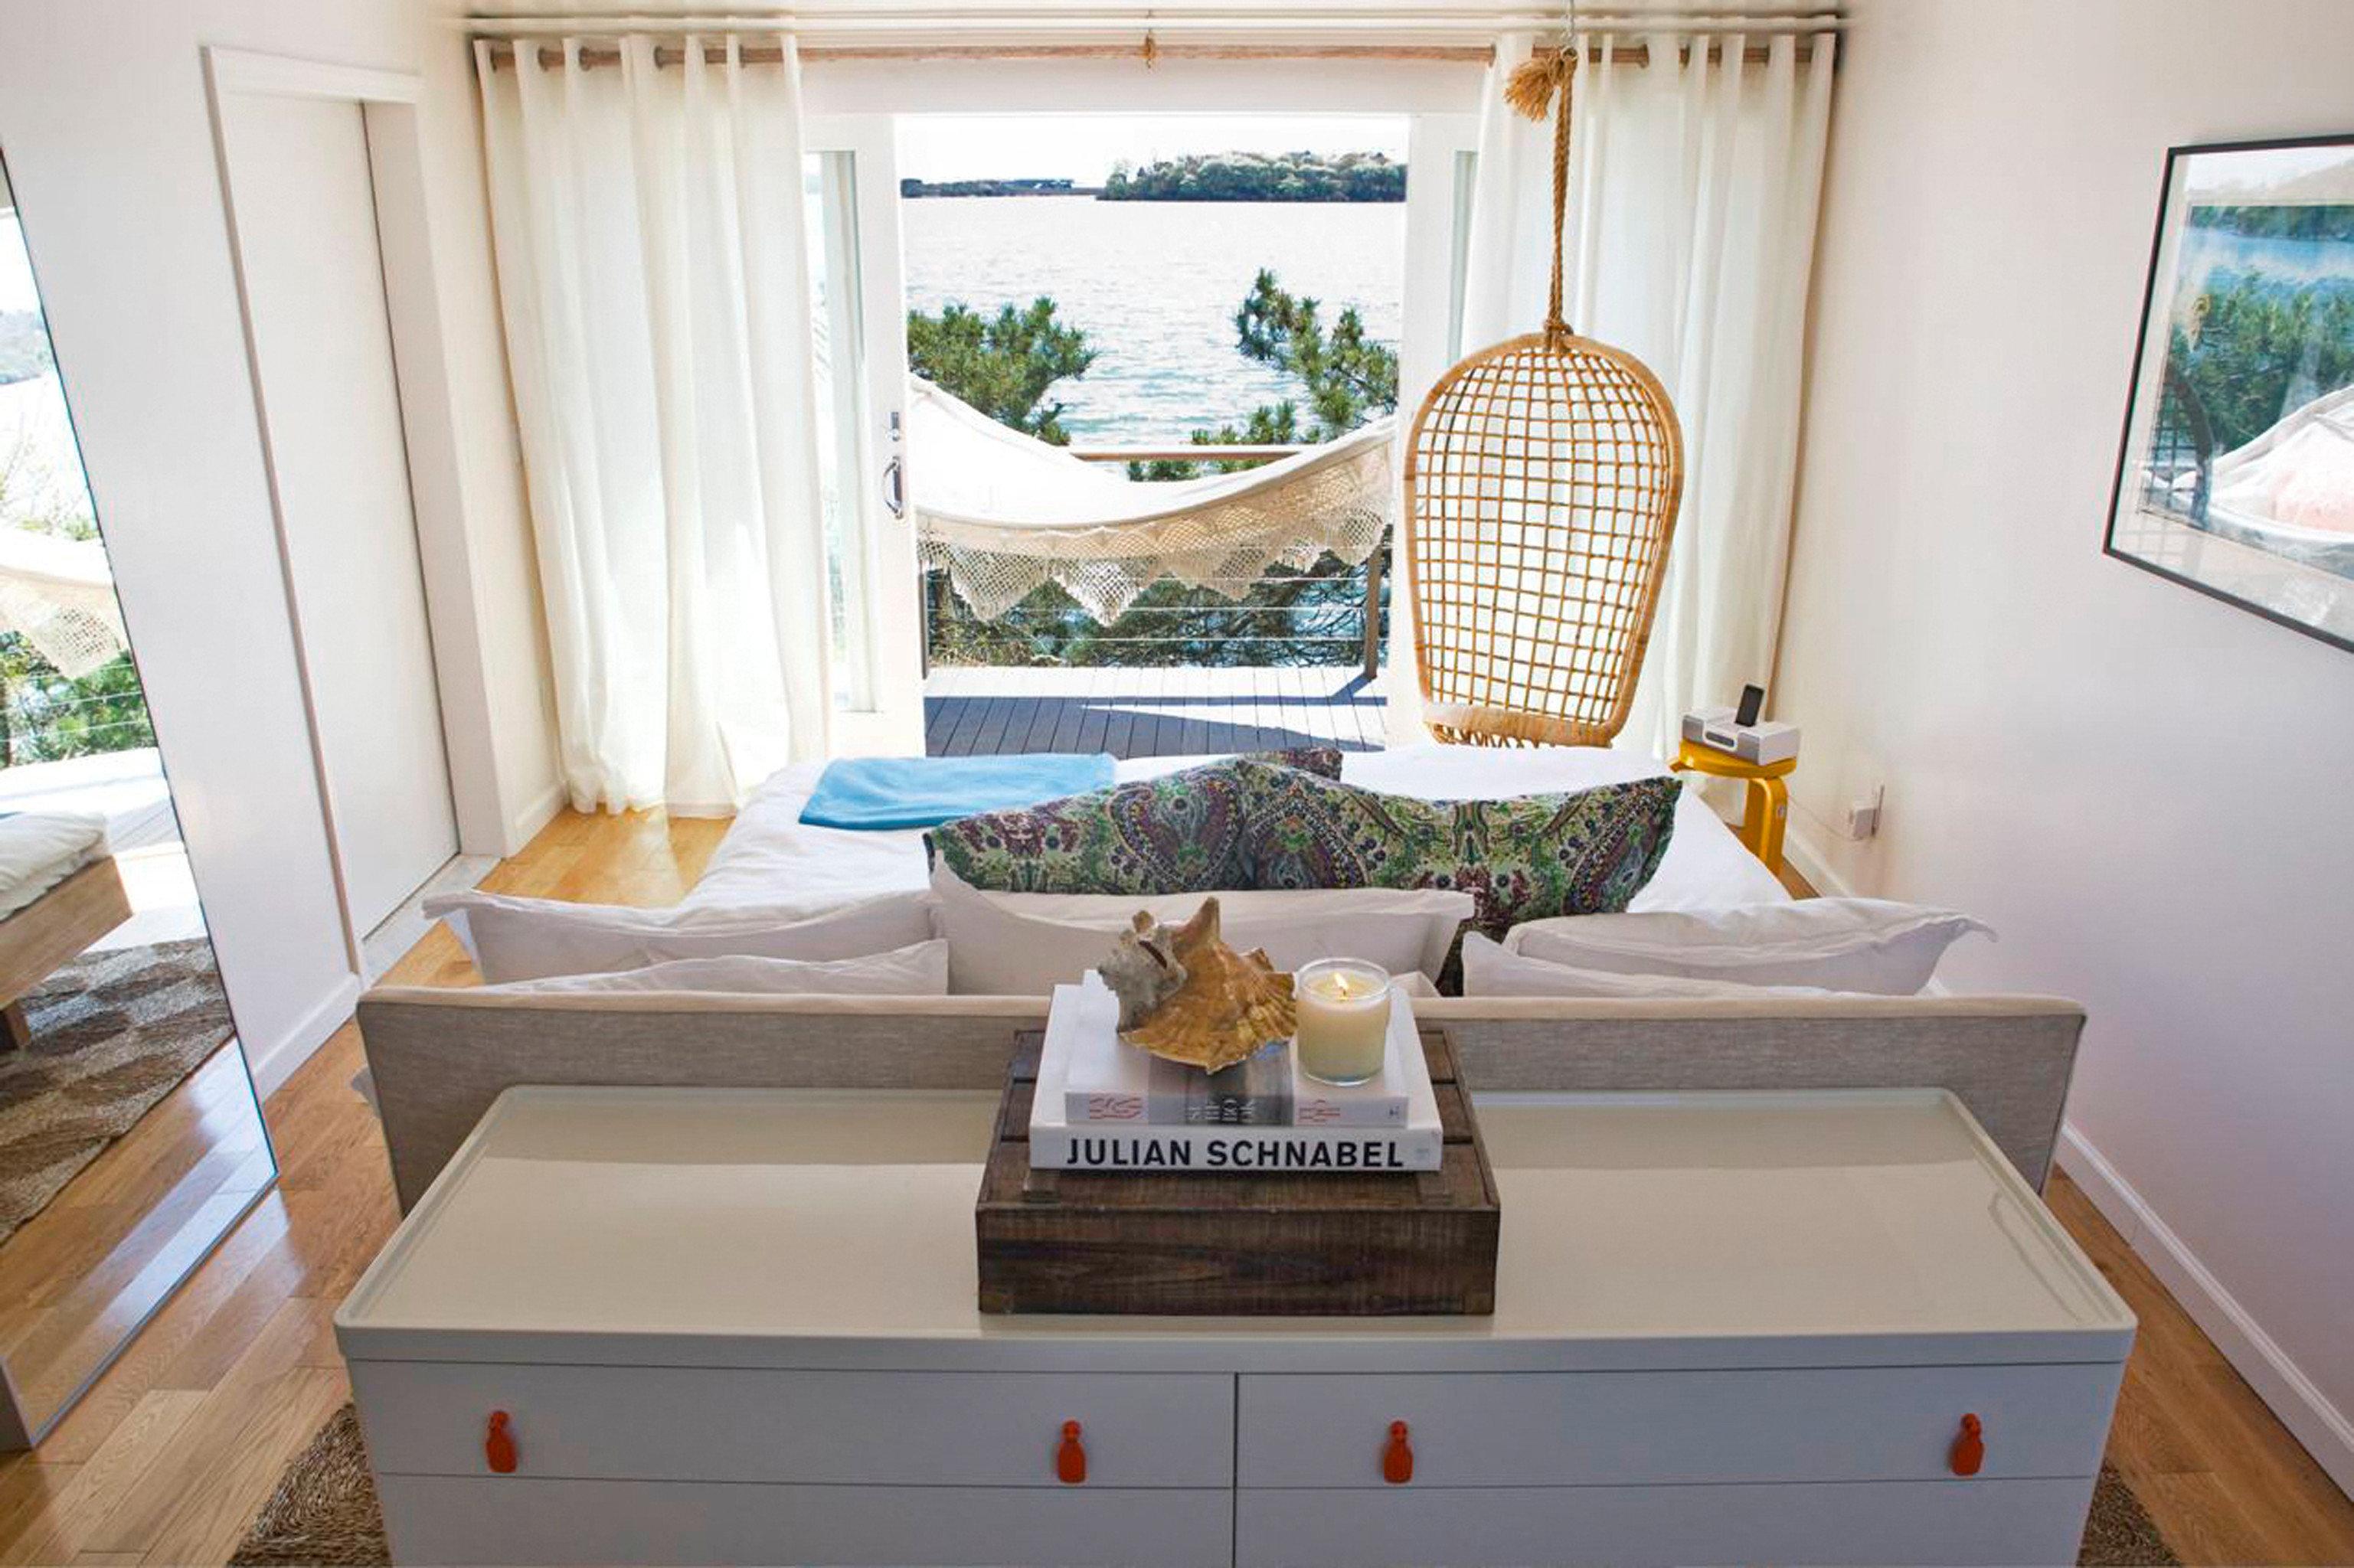 Beach Hotels Romance Solo Travel Trip Ideas Weekend Getaways room property home house estate cottage interior design living room furniture real estate Design